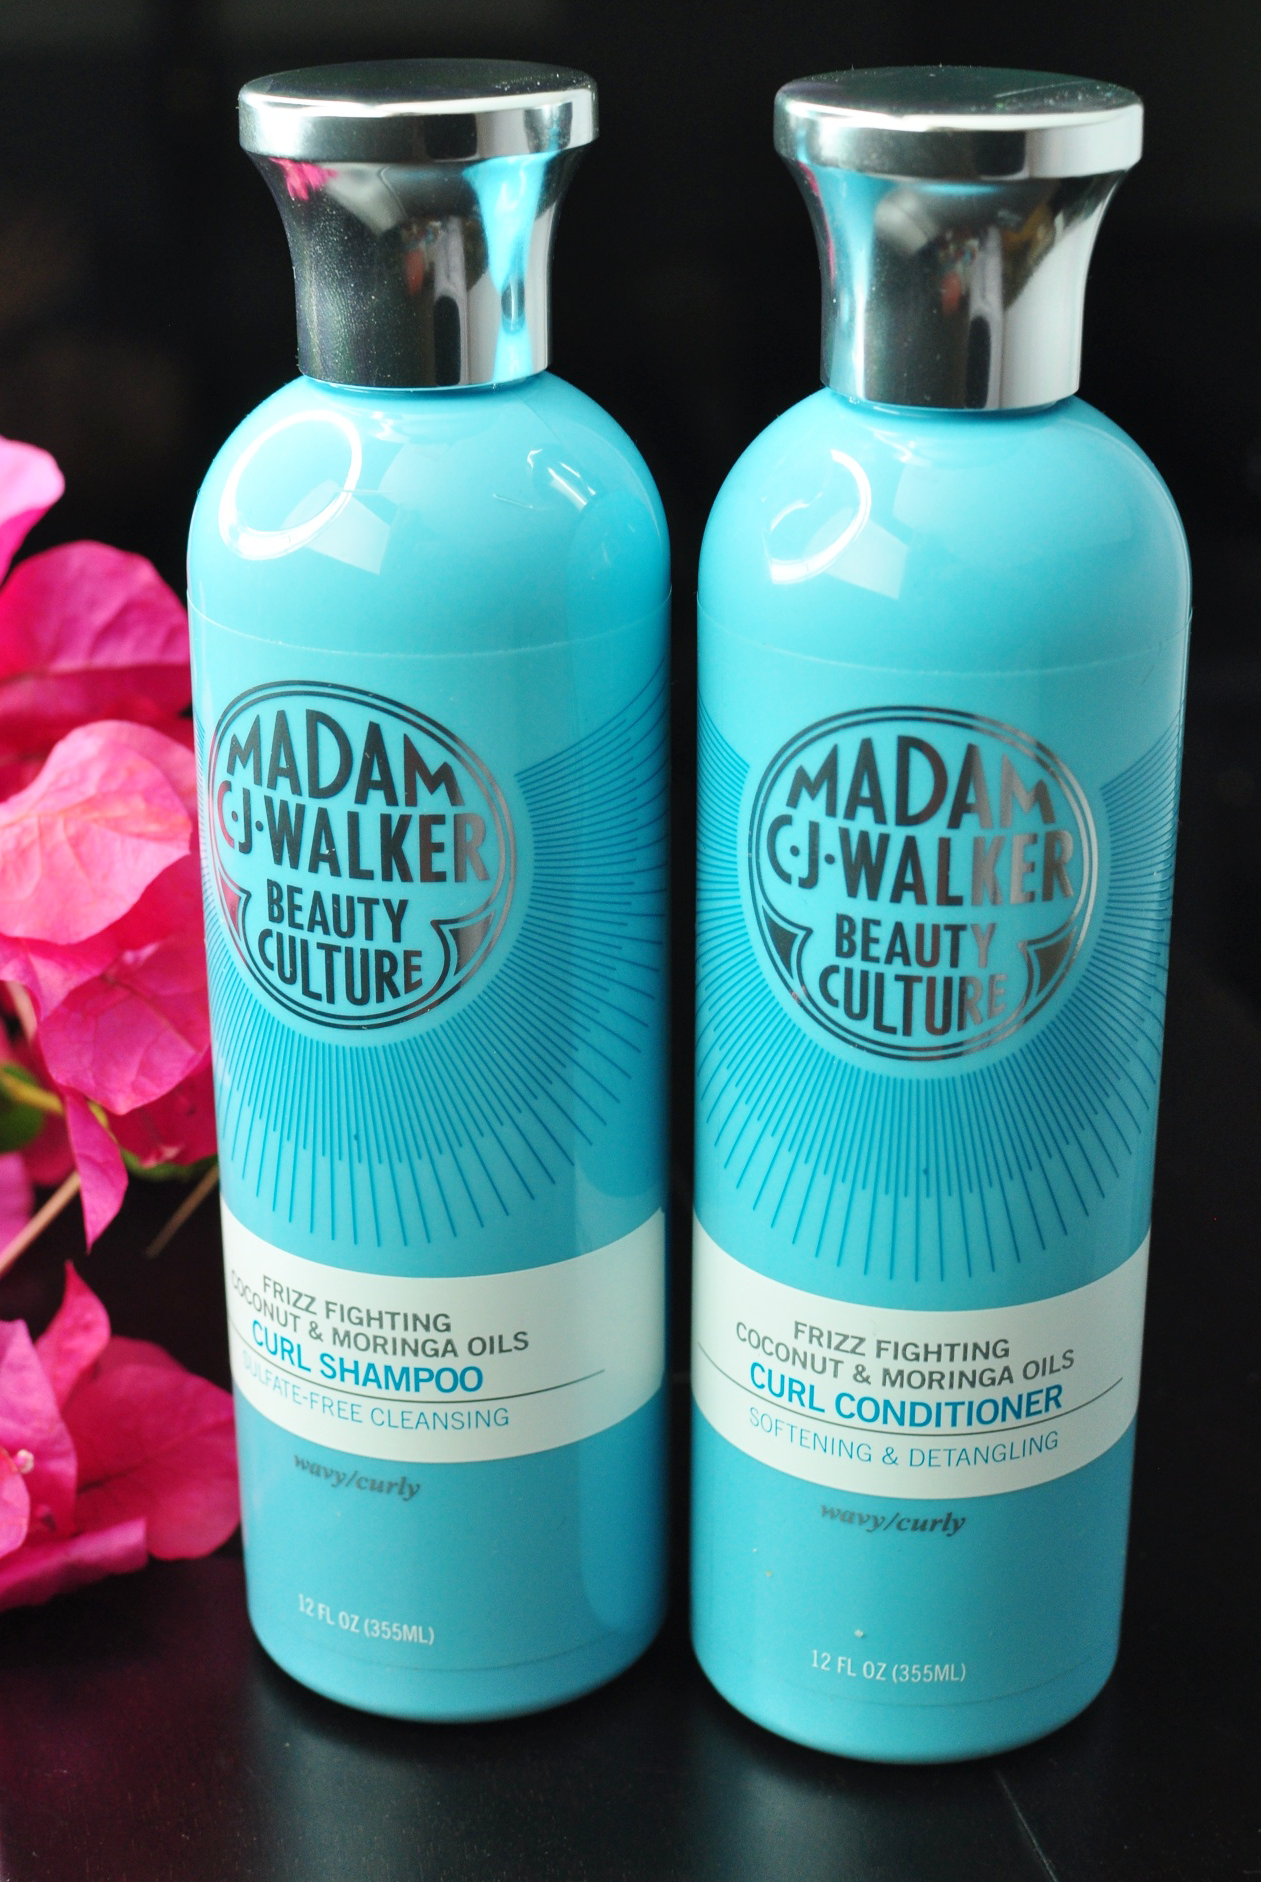 Madam C.J. Walker Beauty Culture Coconut & Moringa Oils